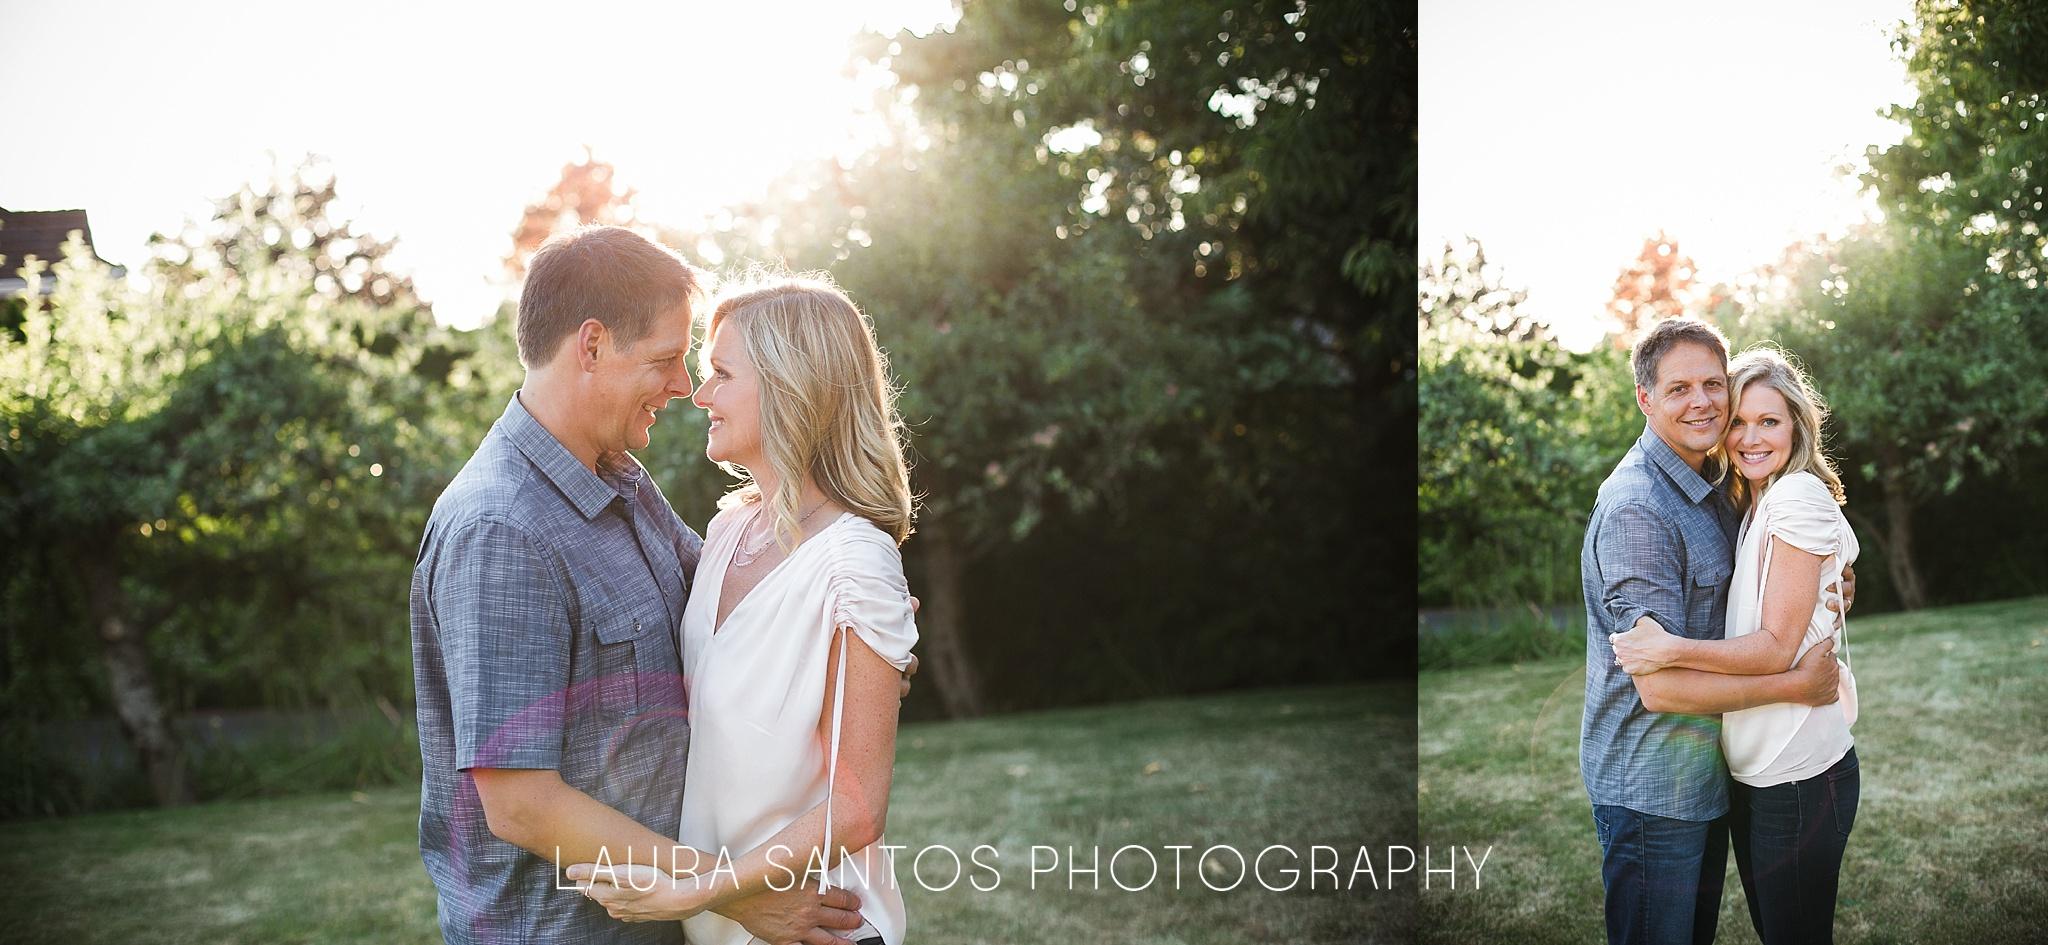 Laura Santos Photography Portland Oregon Family Photographer_0119.jpg